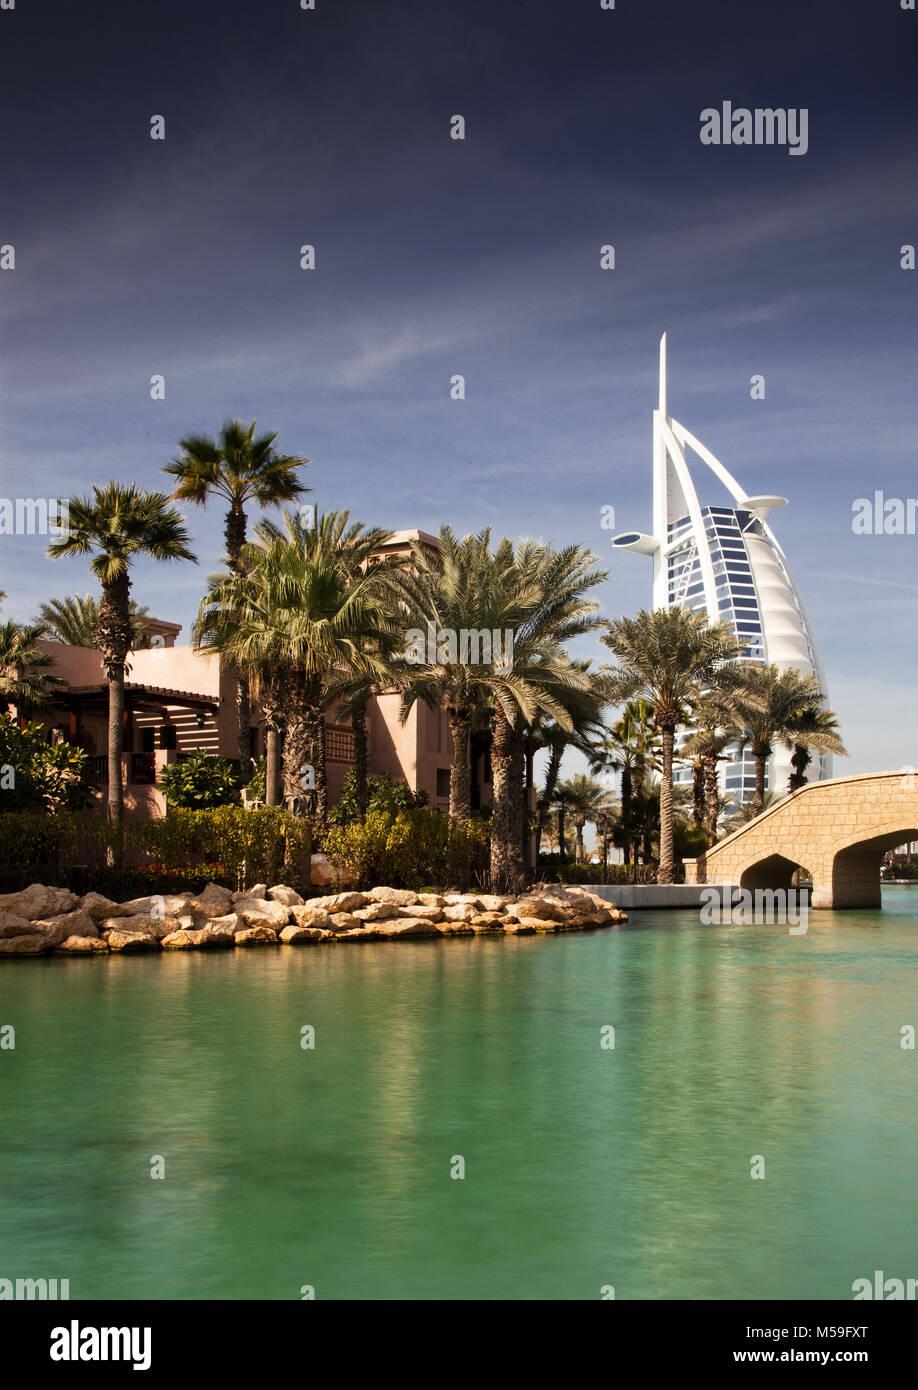 DUBAI, UAE - FEBRUARY, 2018: View on Burj Al Arab, the world only seven stars fotel seen from Madinat Jumeirah. - Stock Image